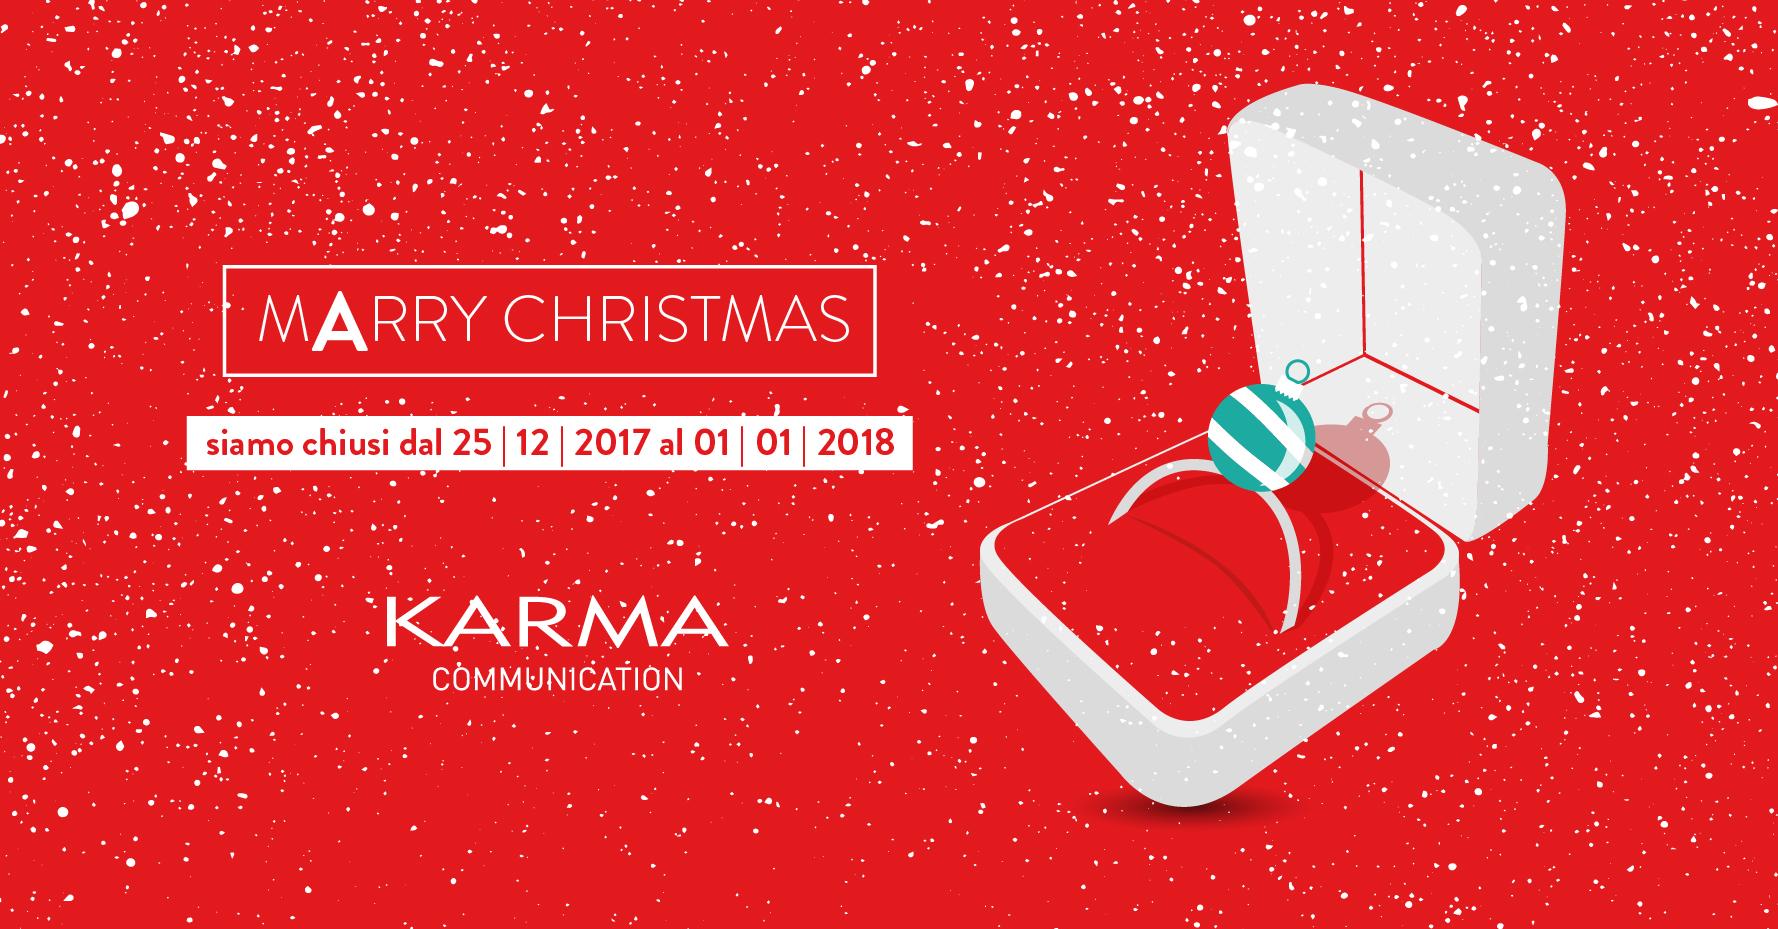 Karma Communication - Auguri di Natale